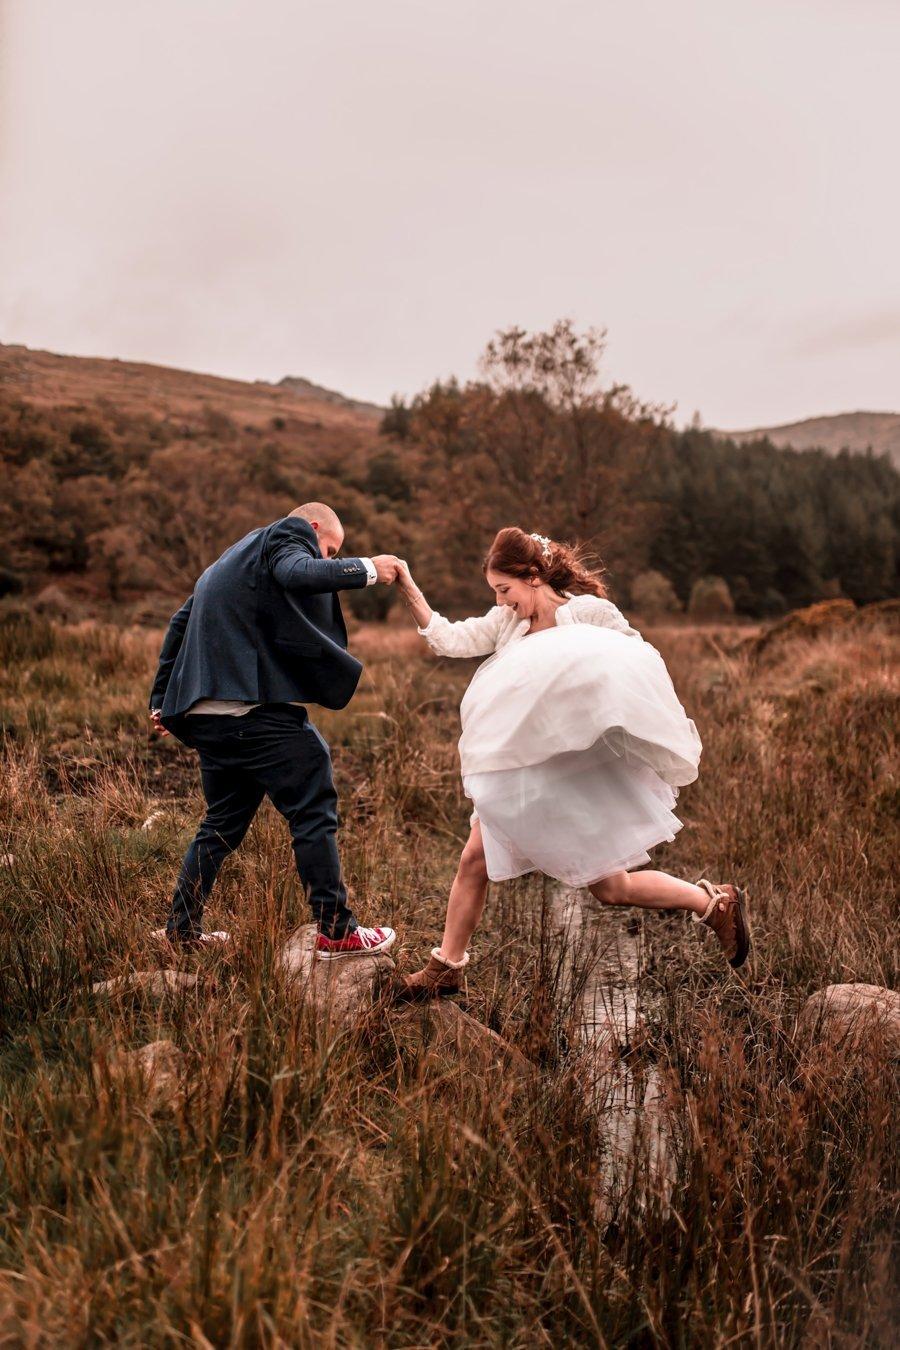 Intimate Romantic Moutain Elopement Wedding in Gougane Barra Cork Ireland